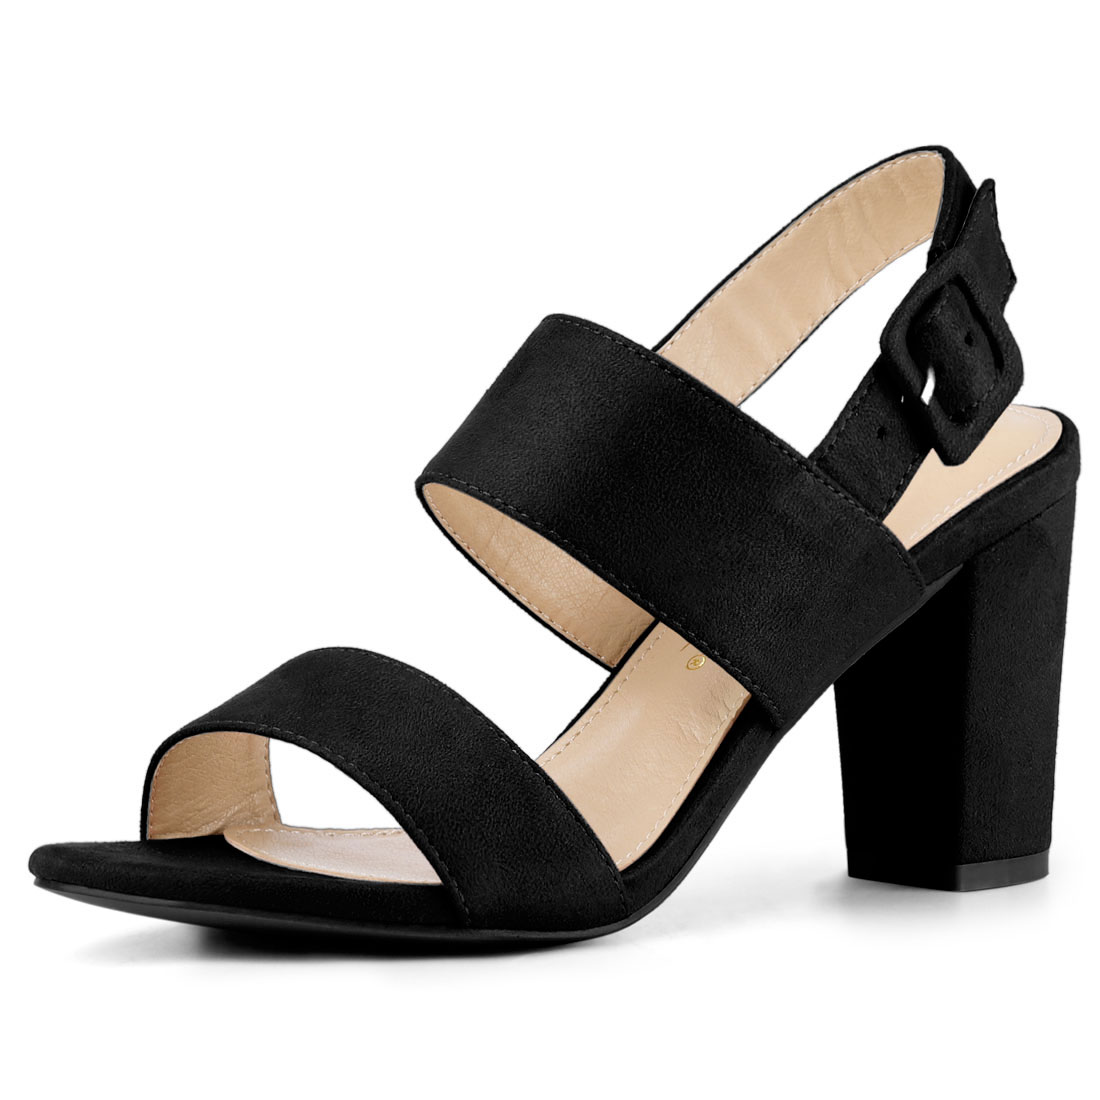 Women Open Toe Slingback High Block Heel Sandals Black US 7.5